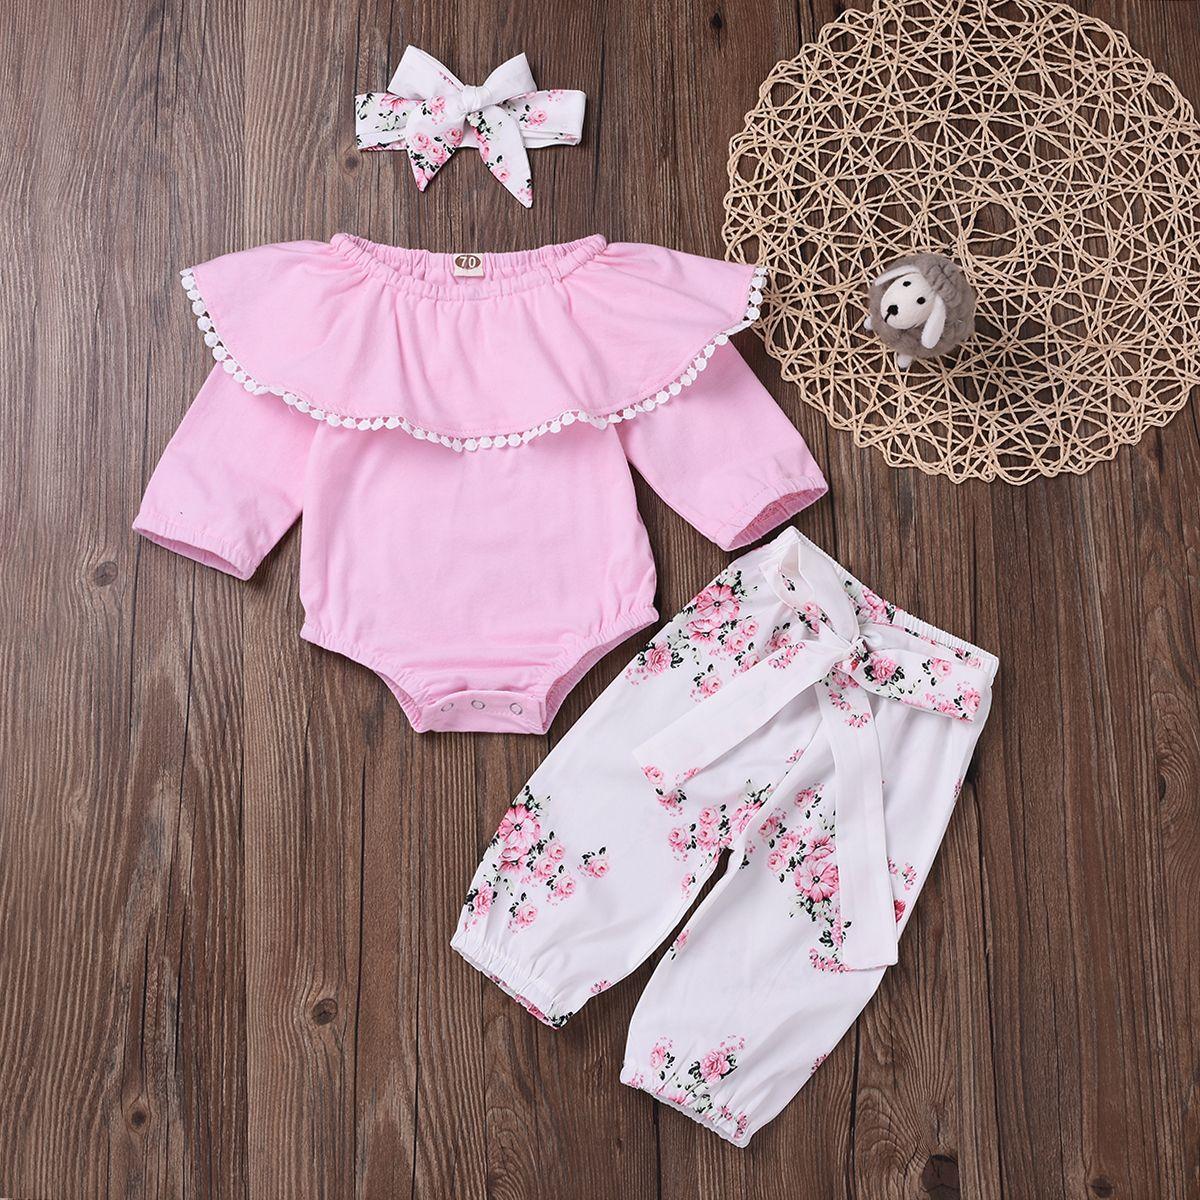 Newborn Baby Girls Long Sleeve Floral Printed Bodysuit+Flouncing Pants+Headband